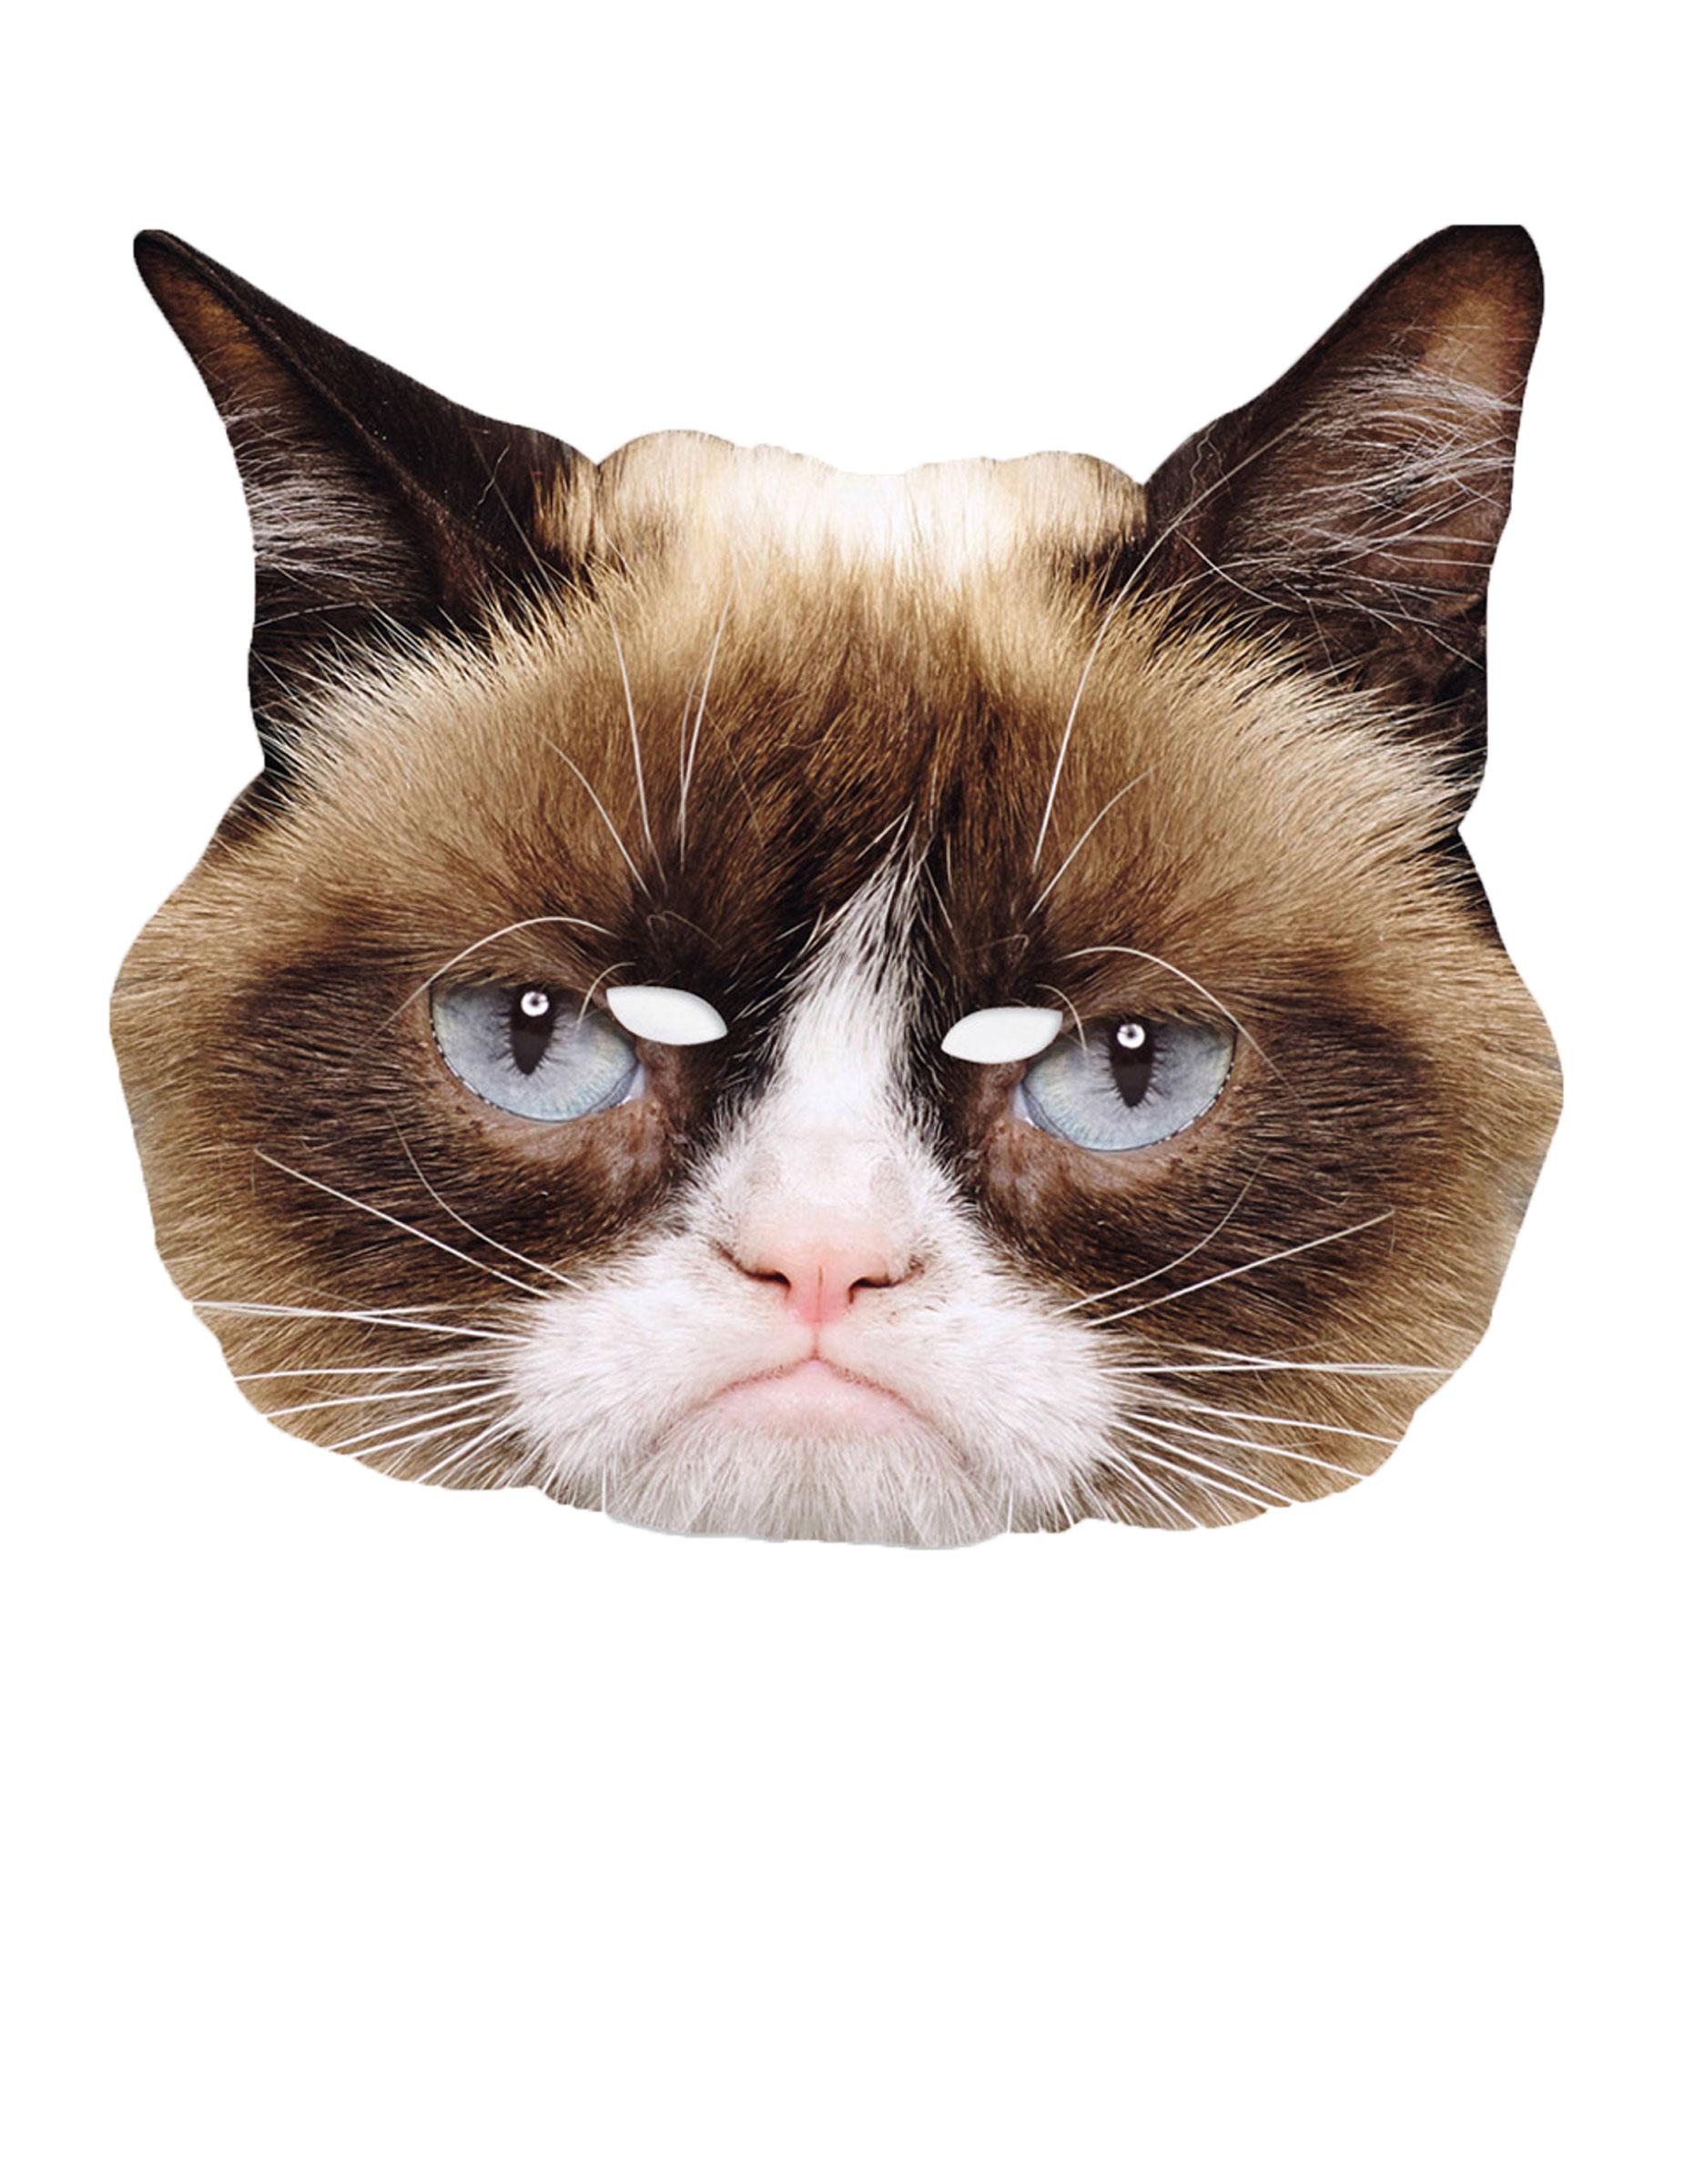 grumpy cat maske lizenzartikel kost mzubeh r bunt g nstige faschings masken bei karneval. Black Bedroom Furniture Sets. Home Design Ideas